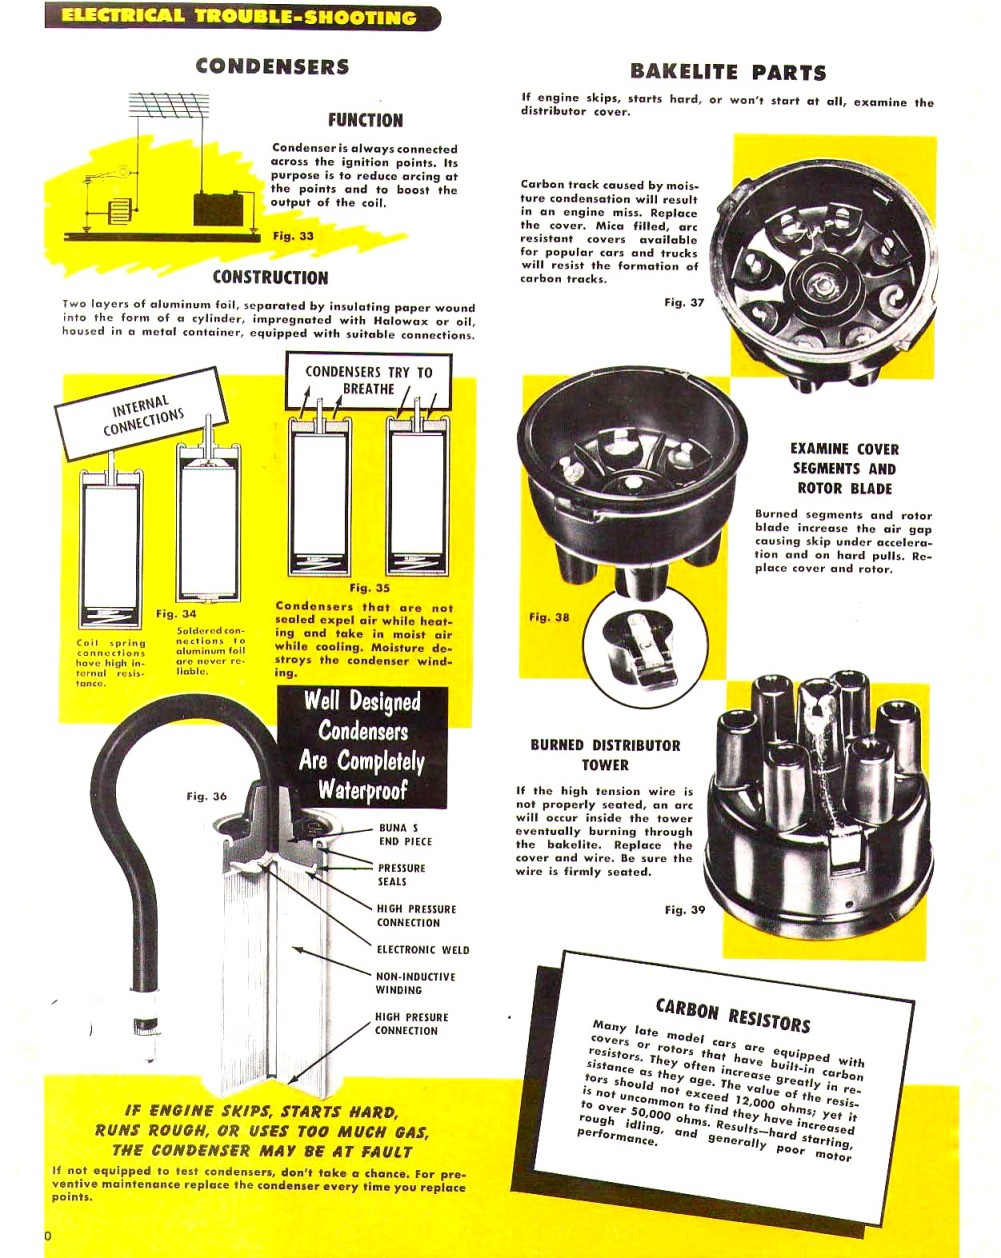 2011 chevy malibu repair manual pdf